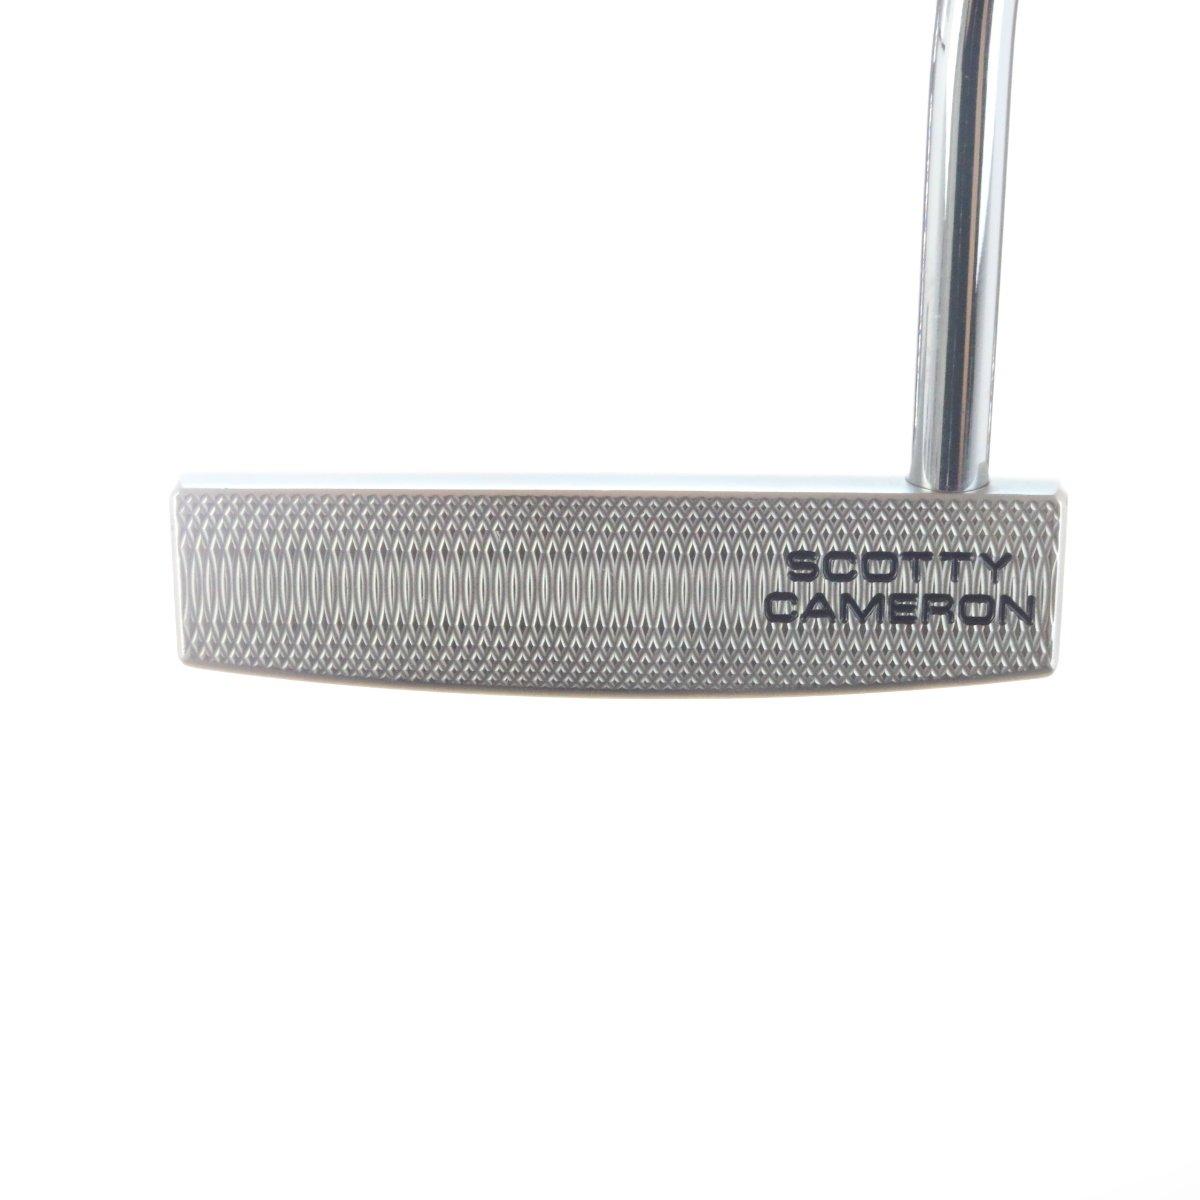 Amazon.com: Scotty Cameron – Golo 7 Putter de golf RH 34 ...